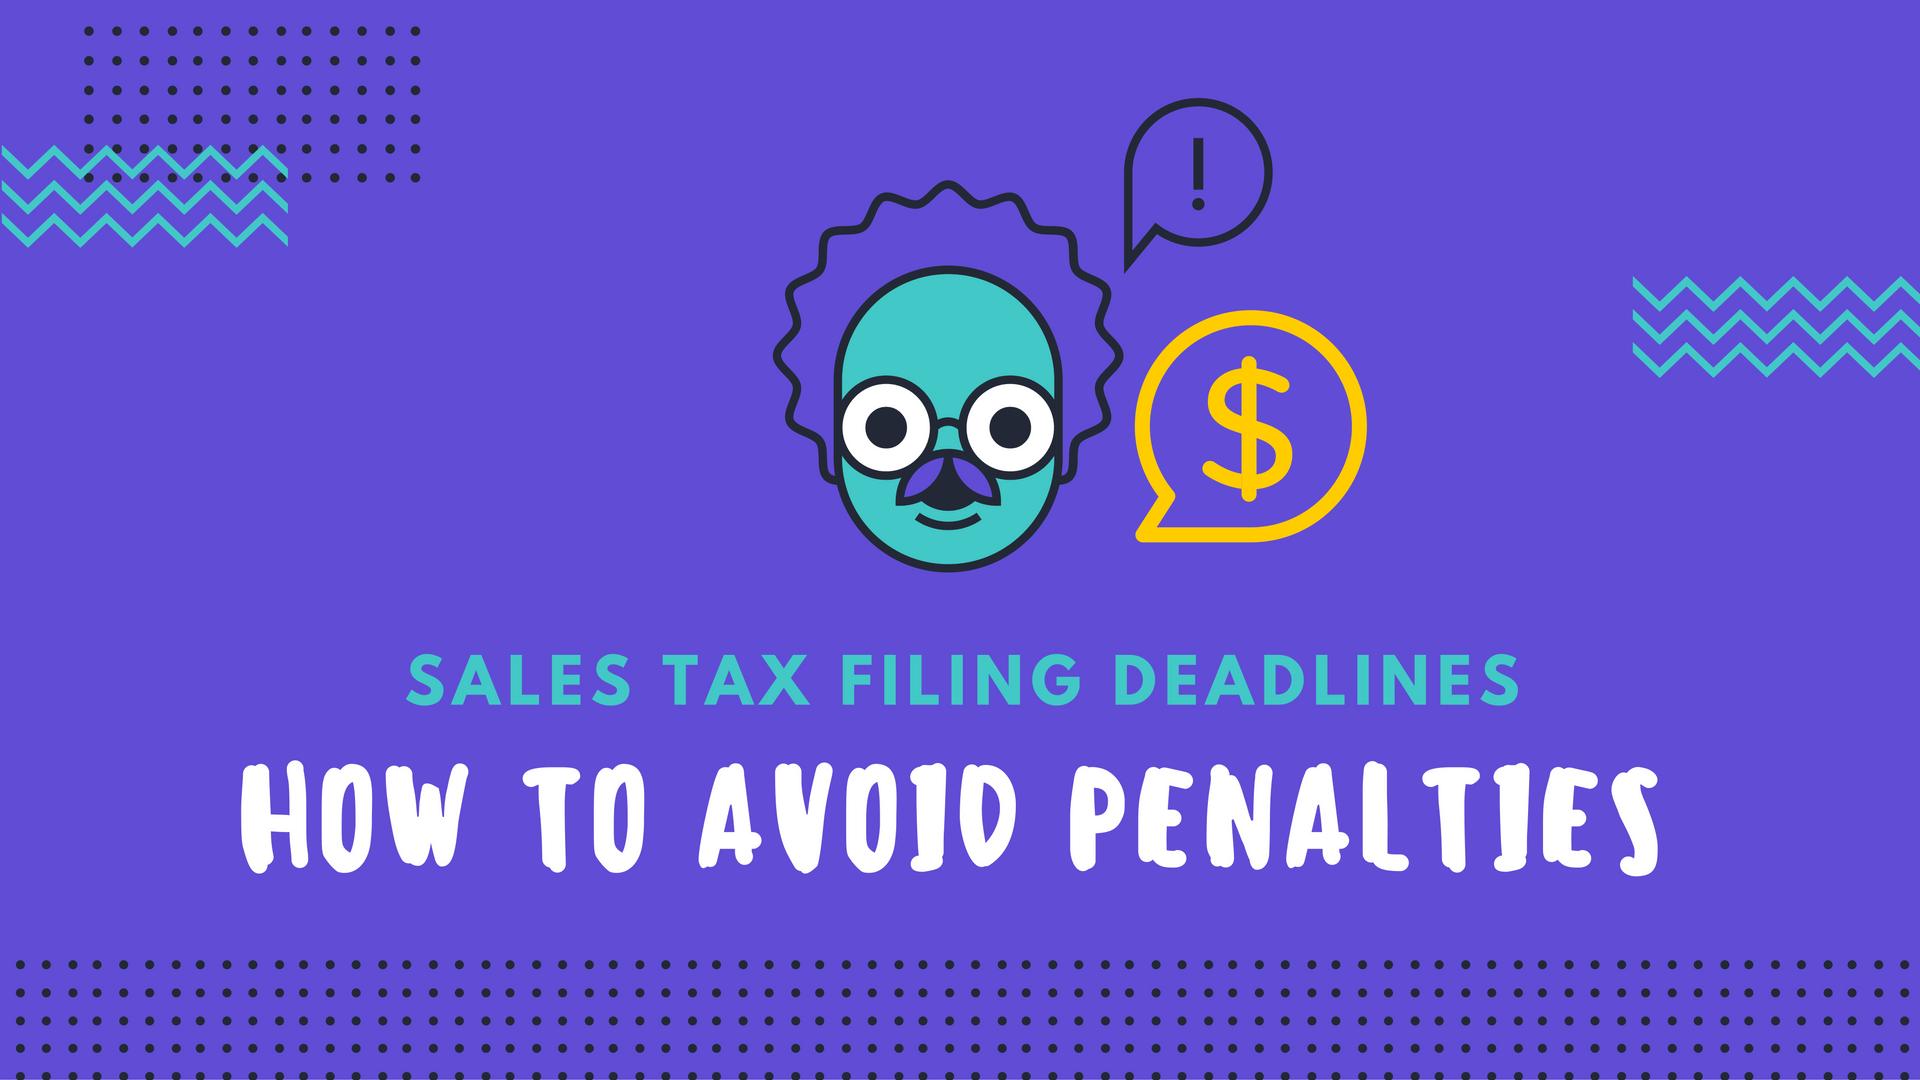 sales tax deadlines - how to avoid penalties